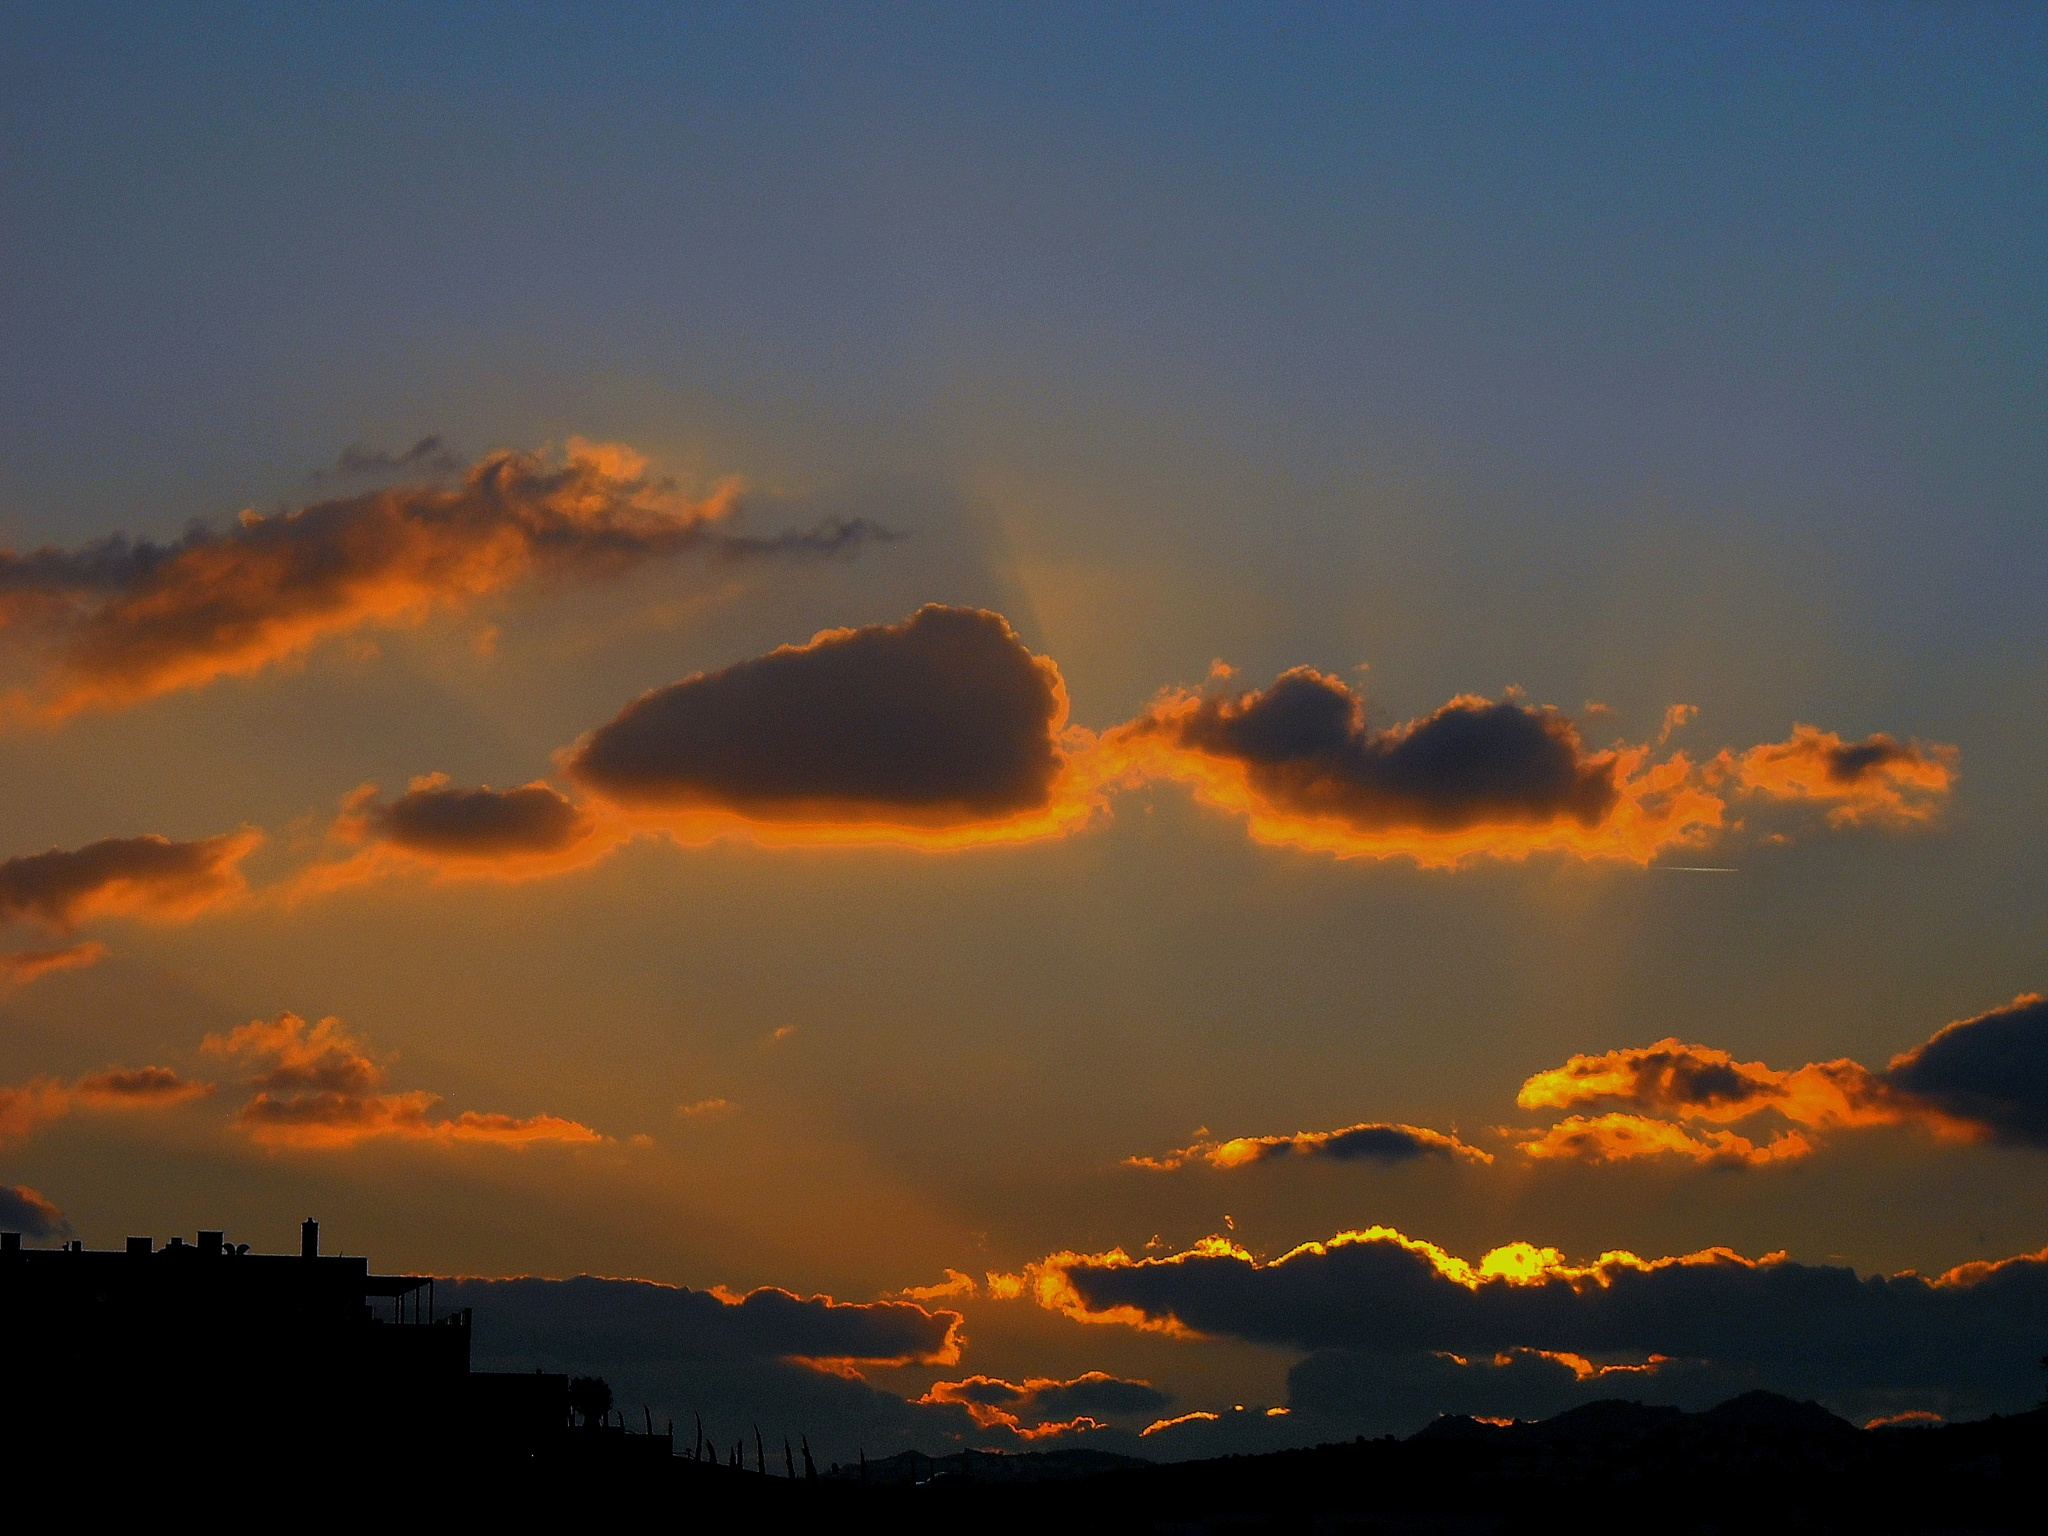 FORGOTTEN SUNSETS 74 by Akin Saner